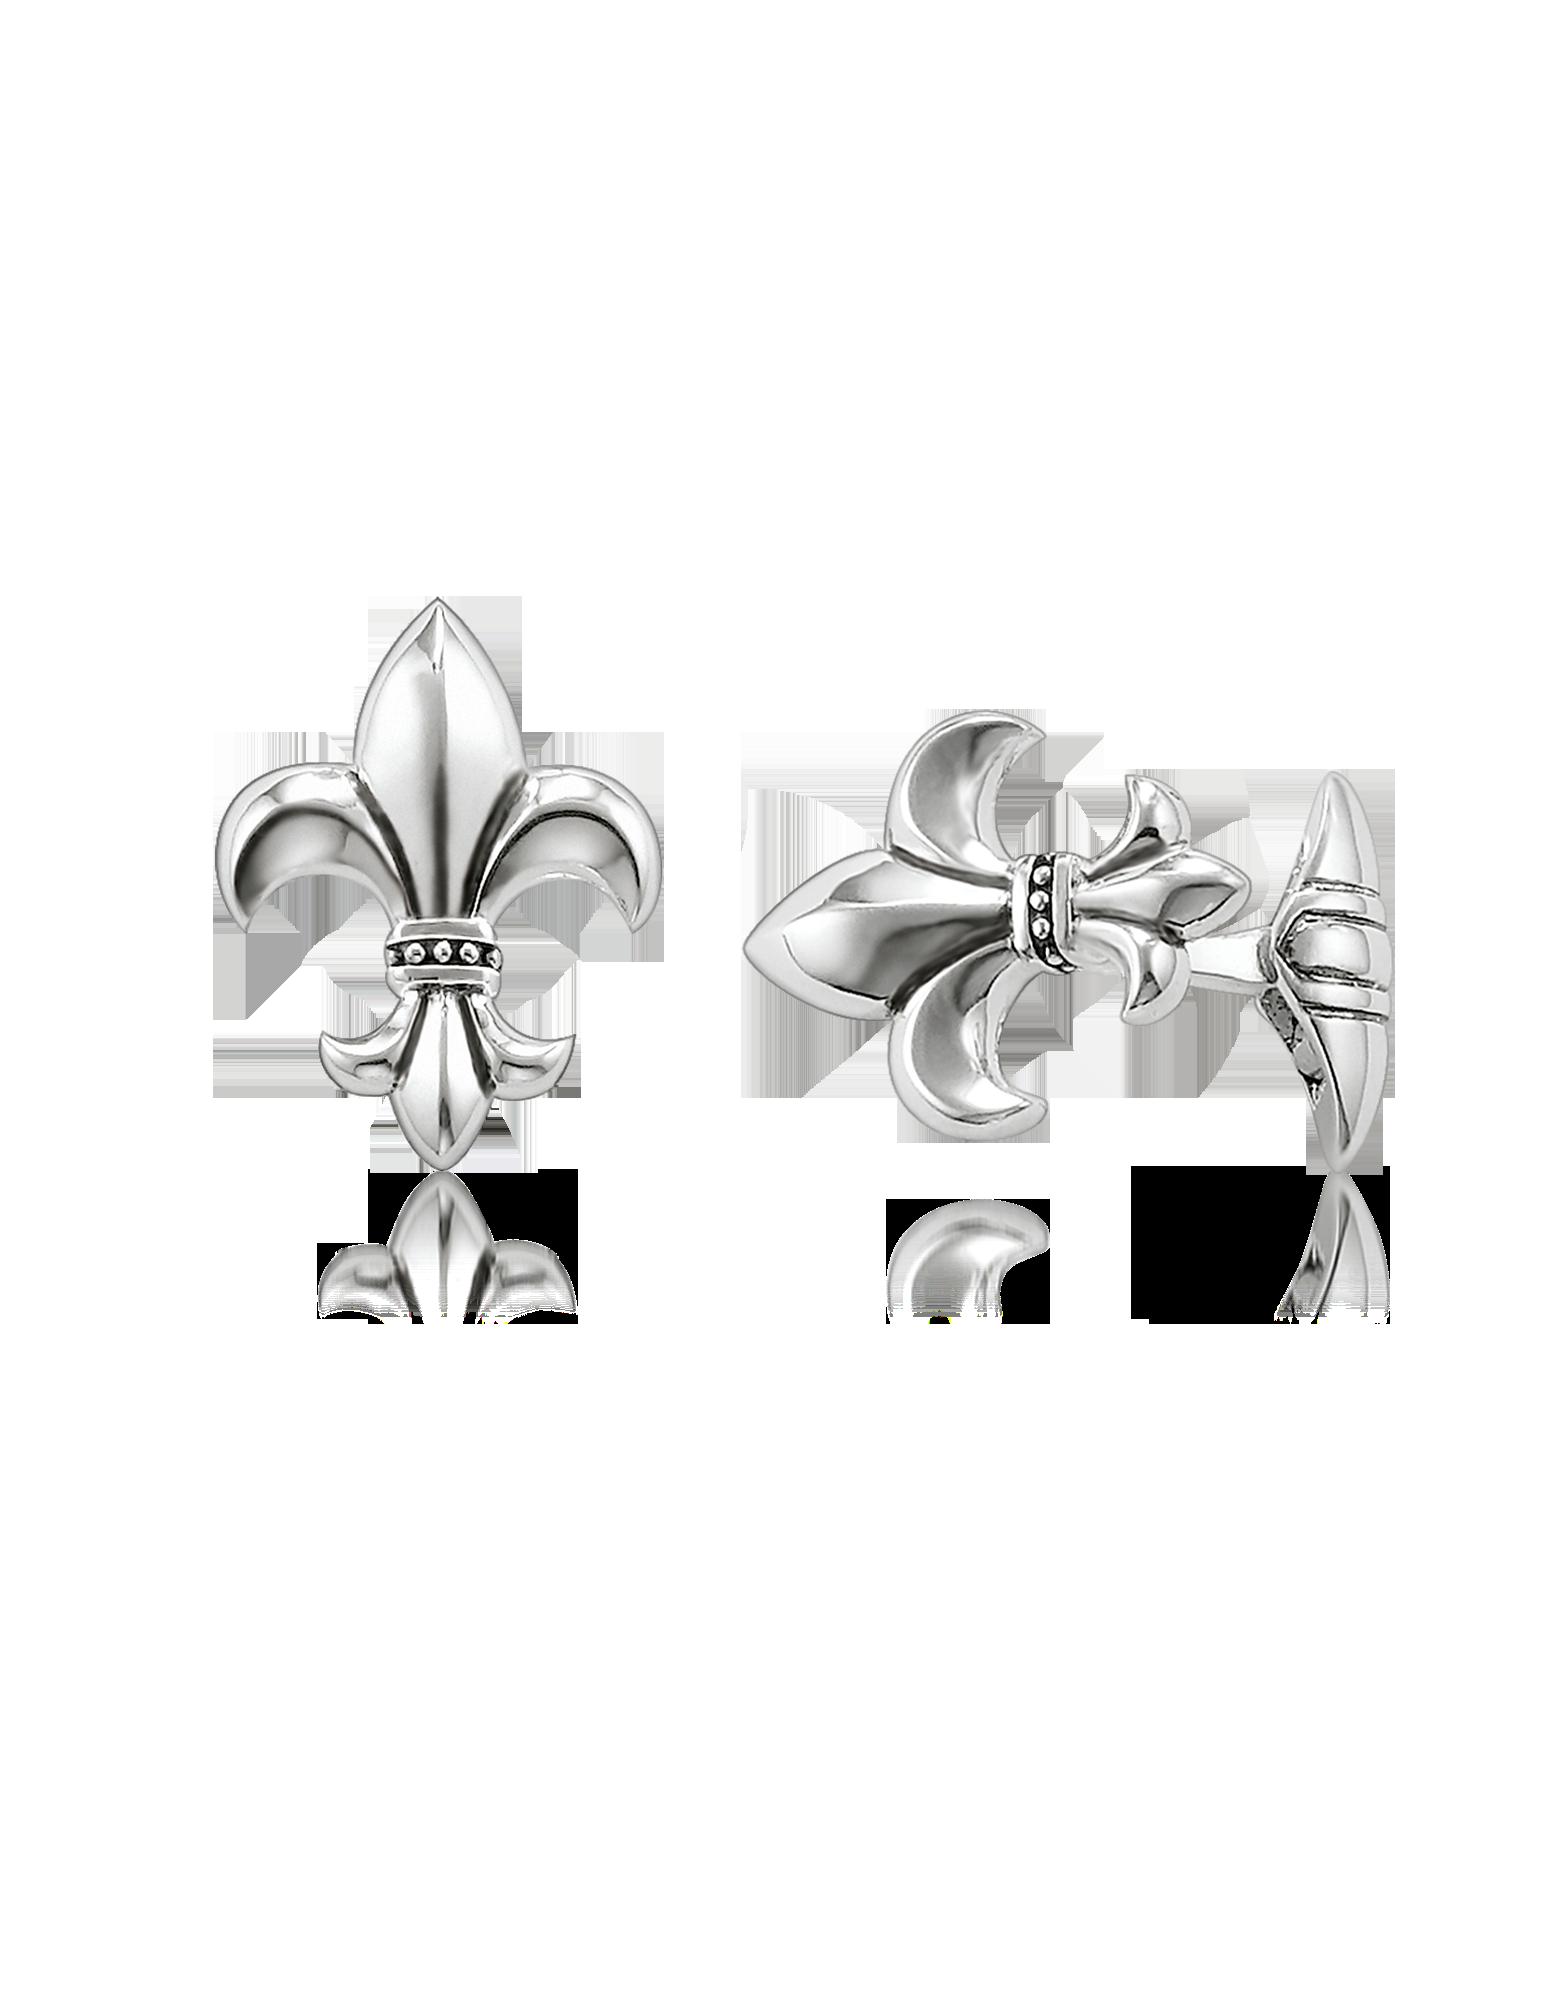 Image of Blackened Sterling silver Fleur-de-lis Cufflinks